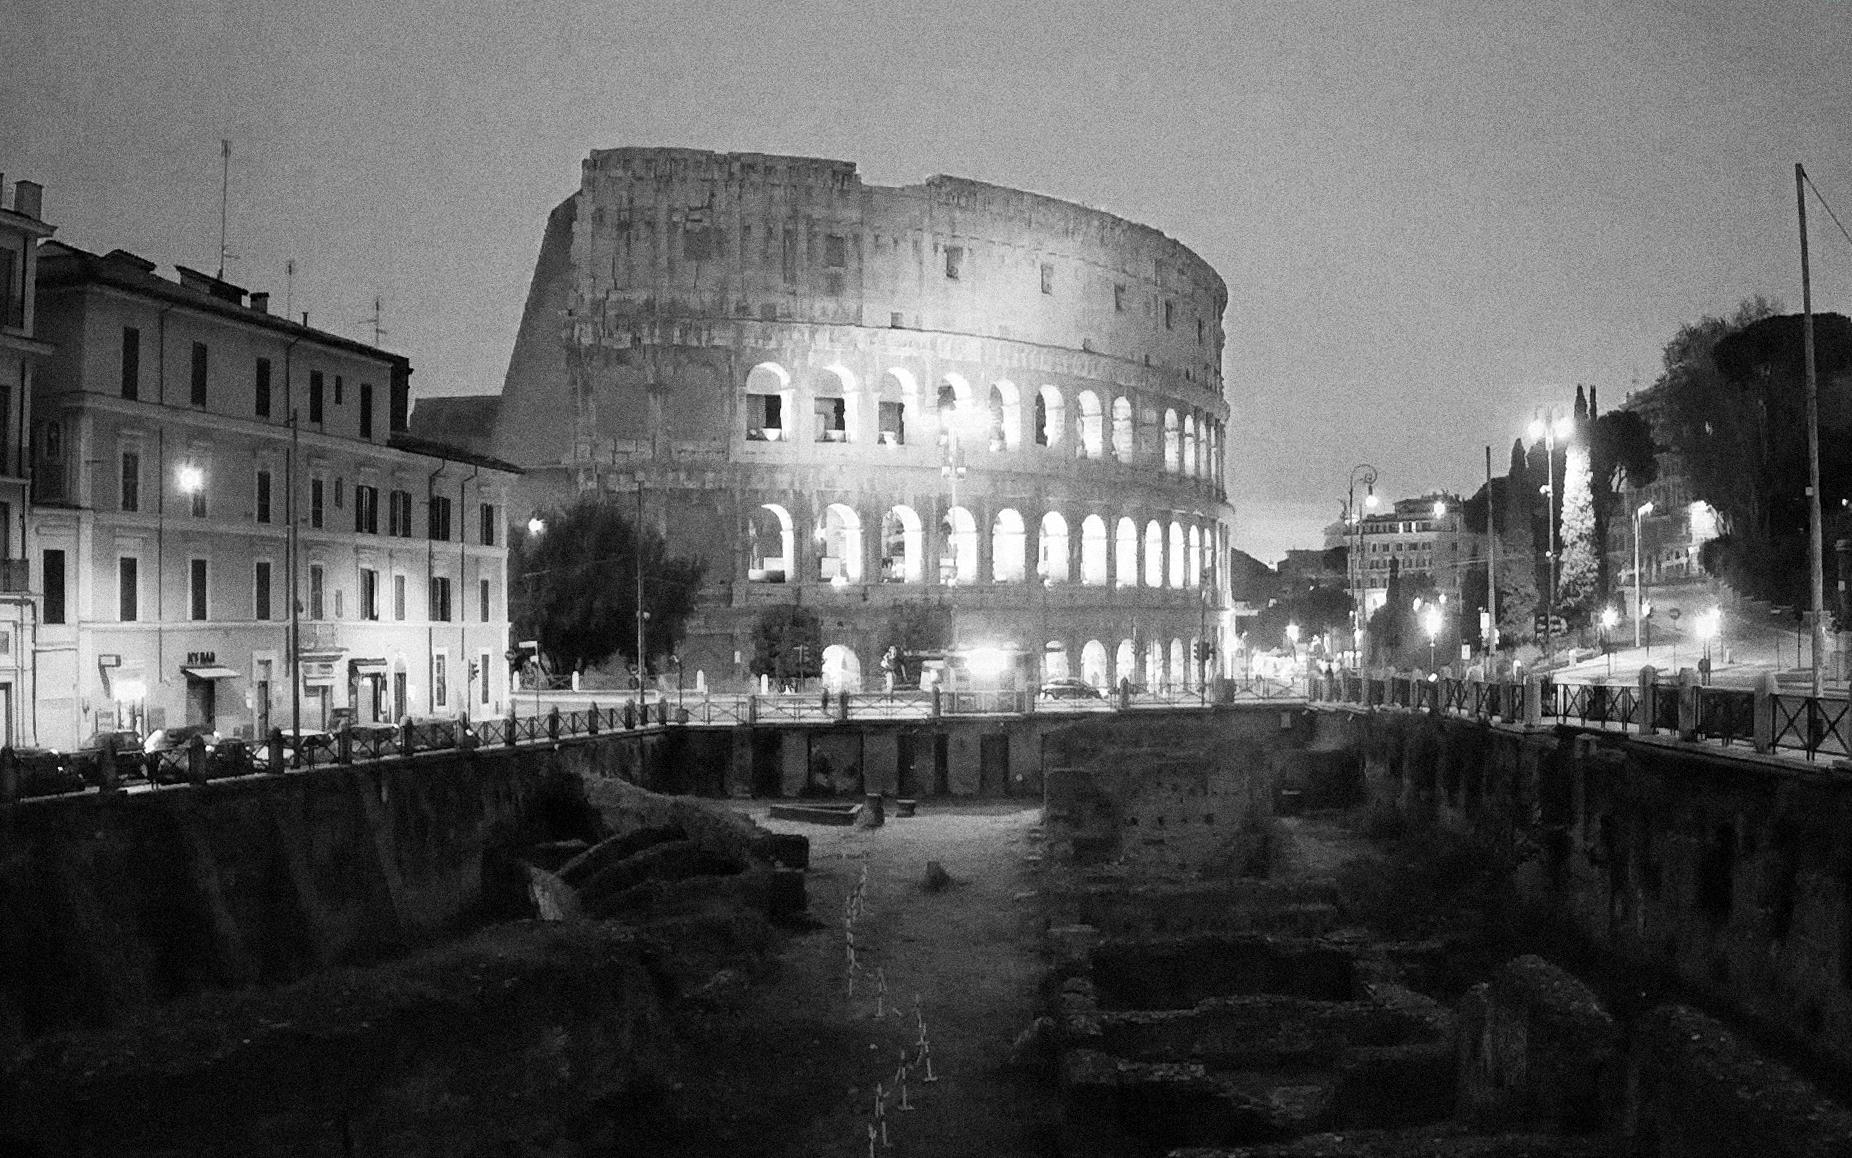 Rome, Colosseum, Radisics, Italy, Hungary